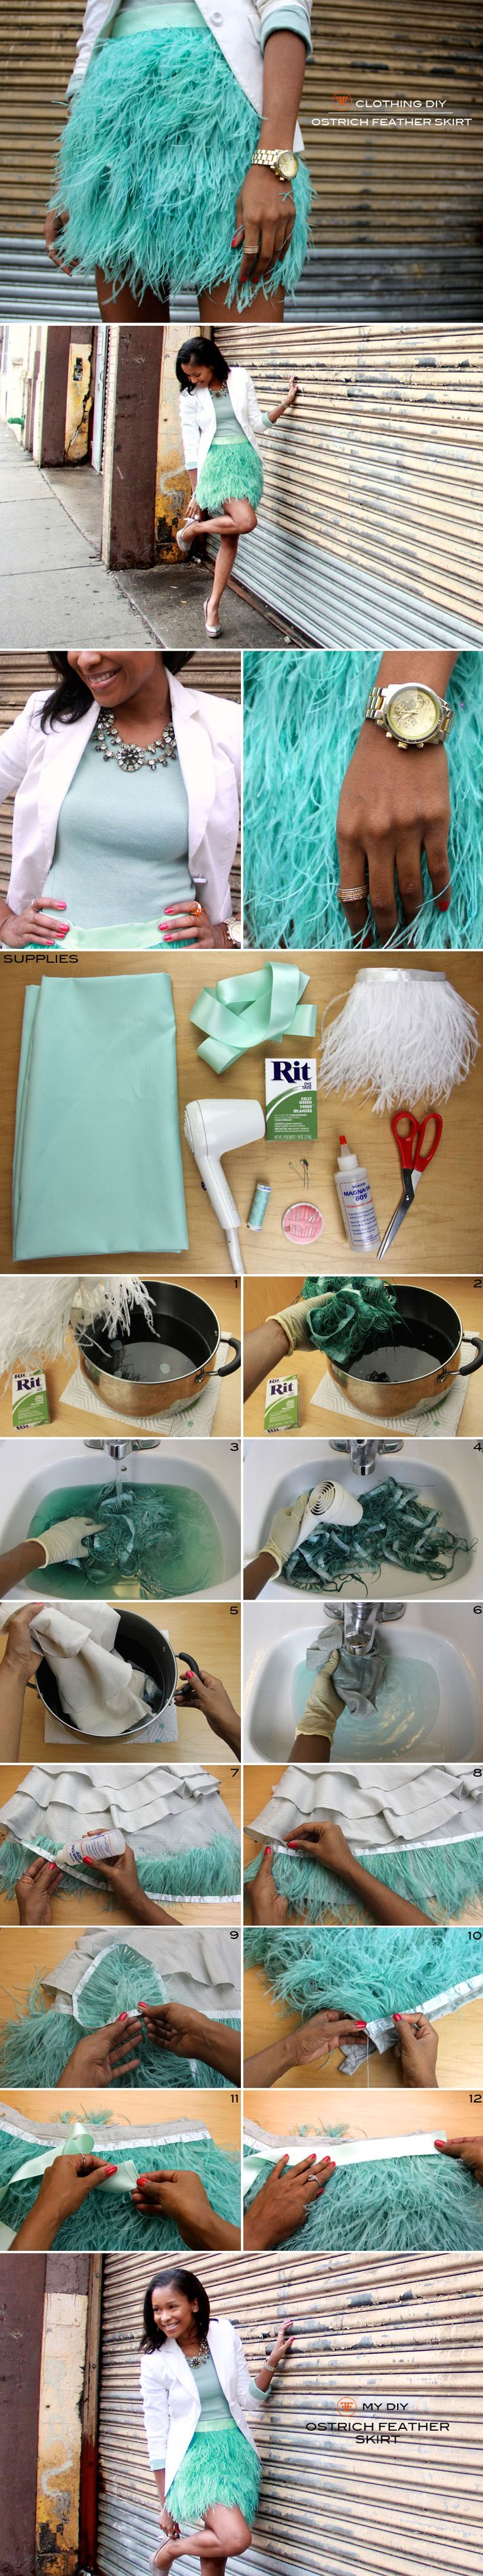 Ostrich Feather Skirt #pistachio #springcolortrend | Frugal-nomics.com